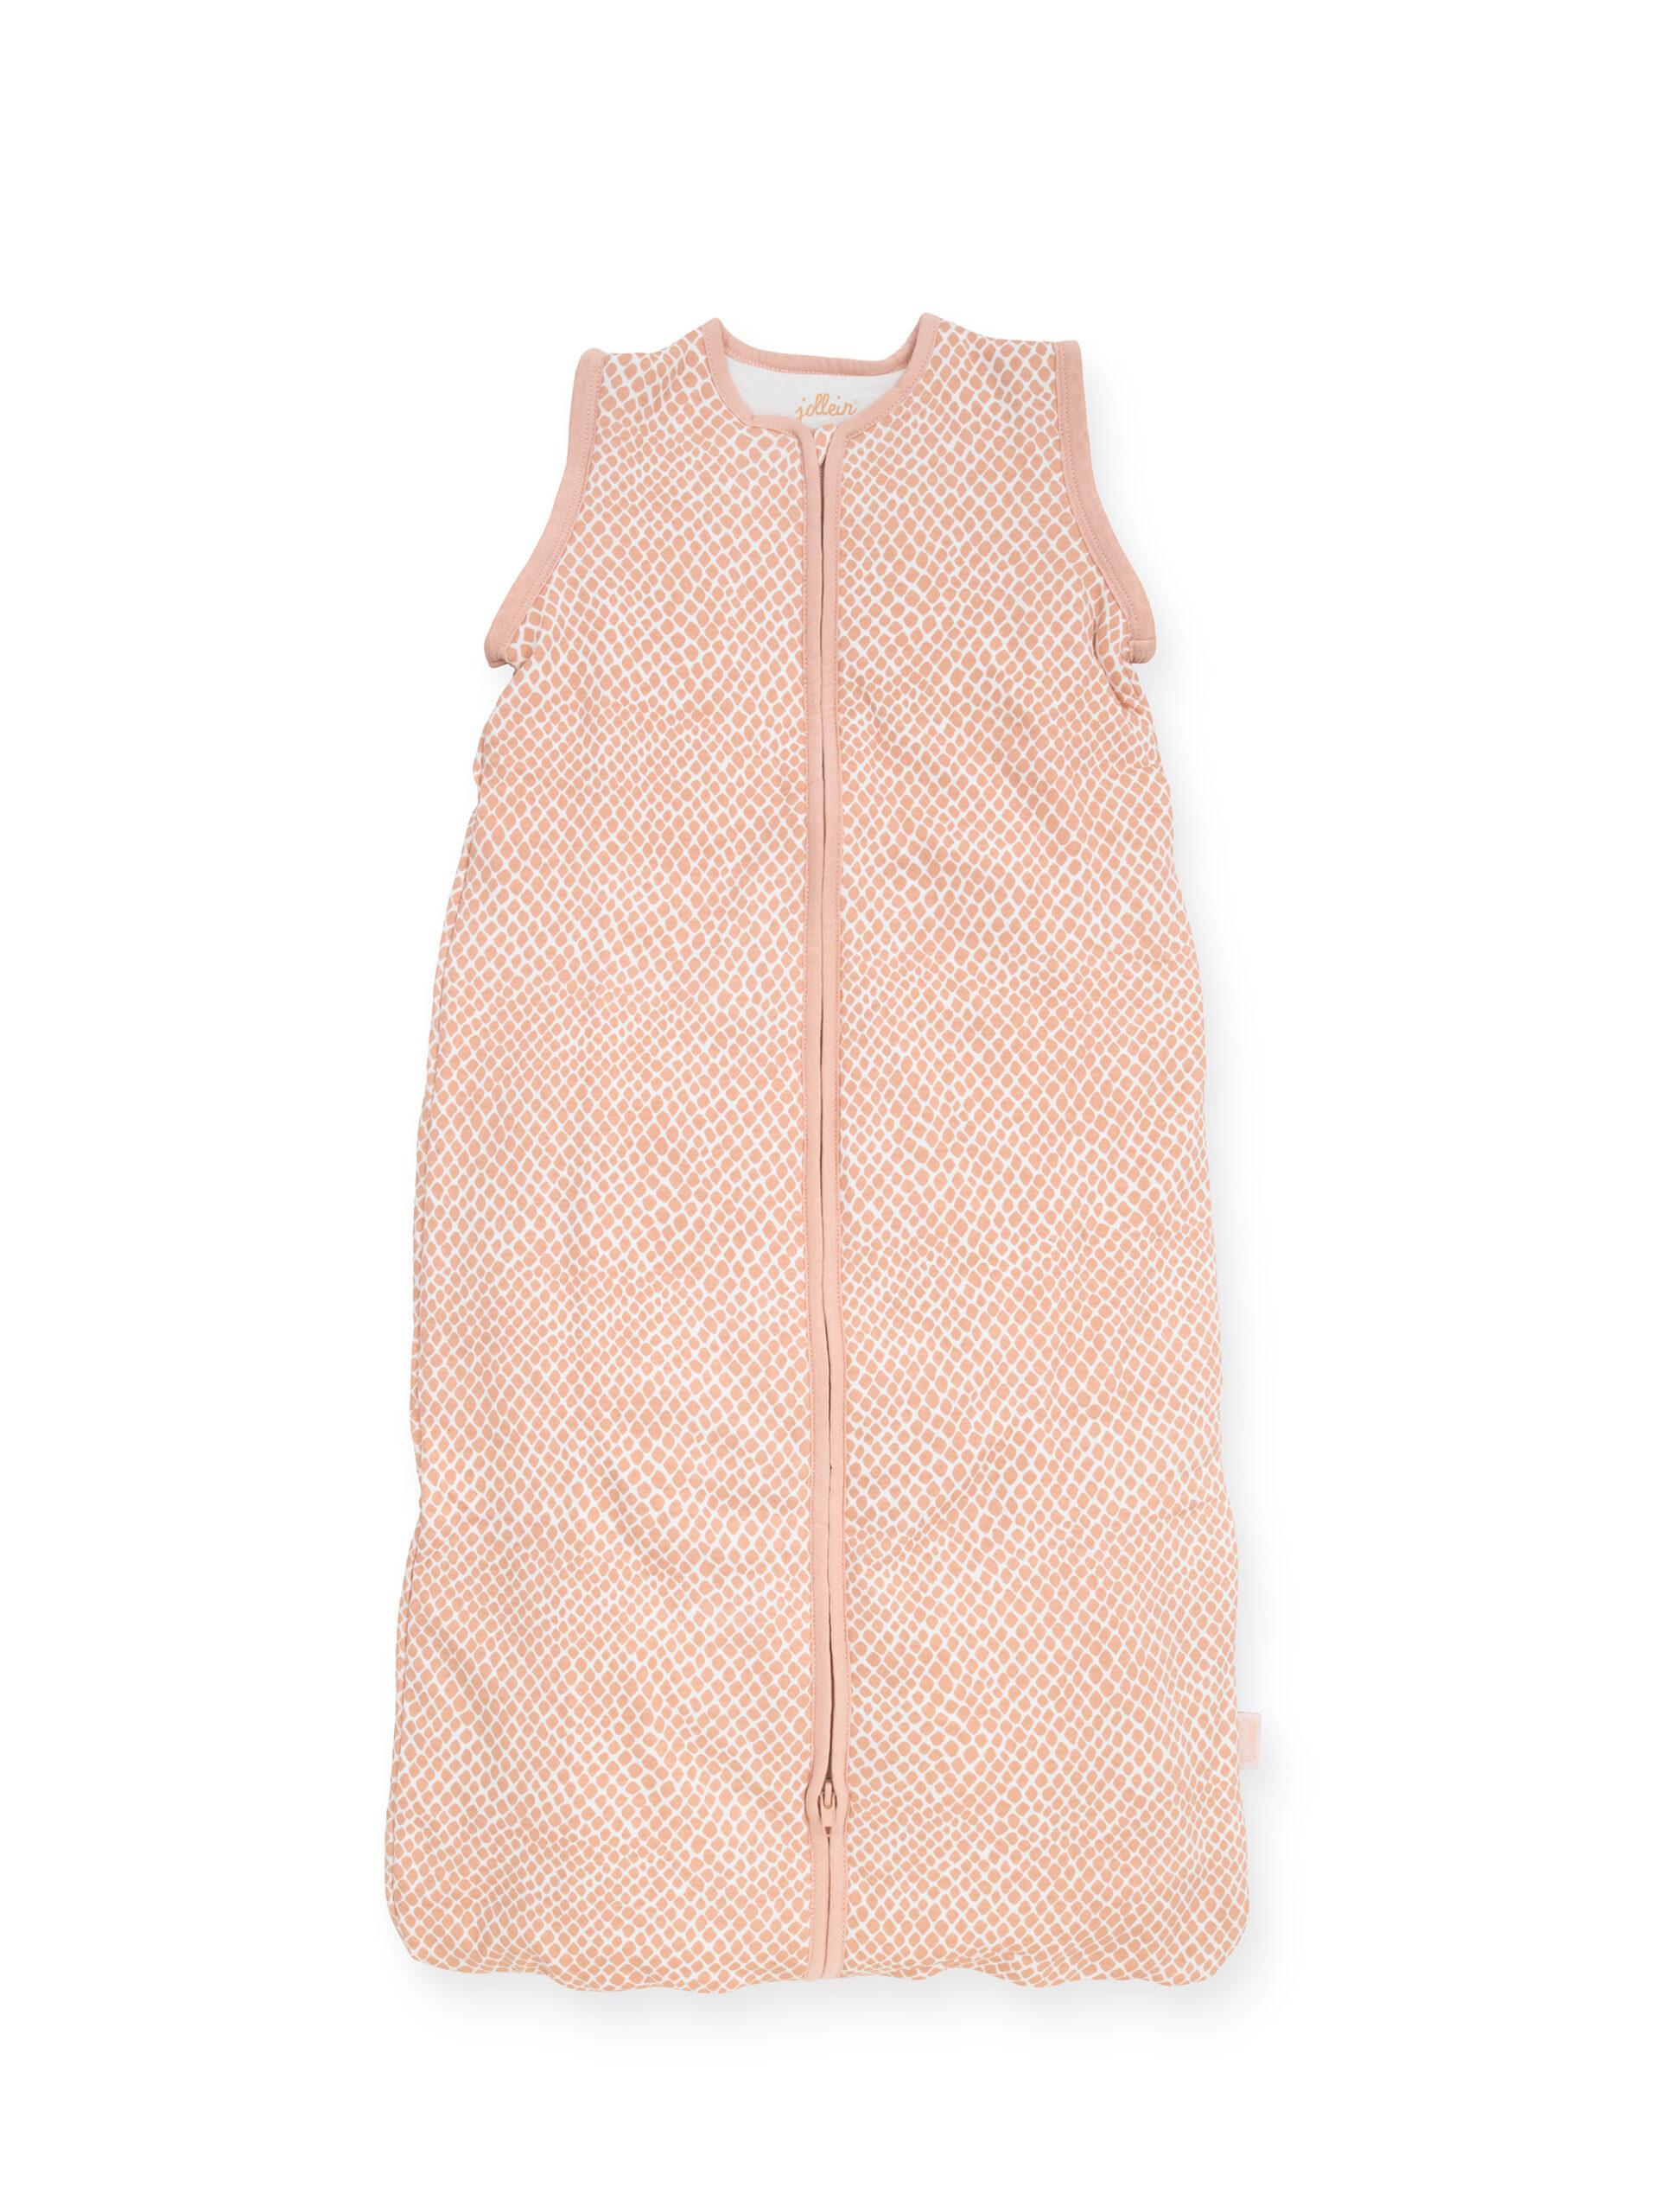 Afbeelding Babyslaapzak 110cm Snake pale pink met afritsbare mouw